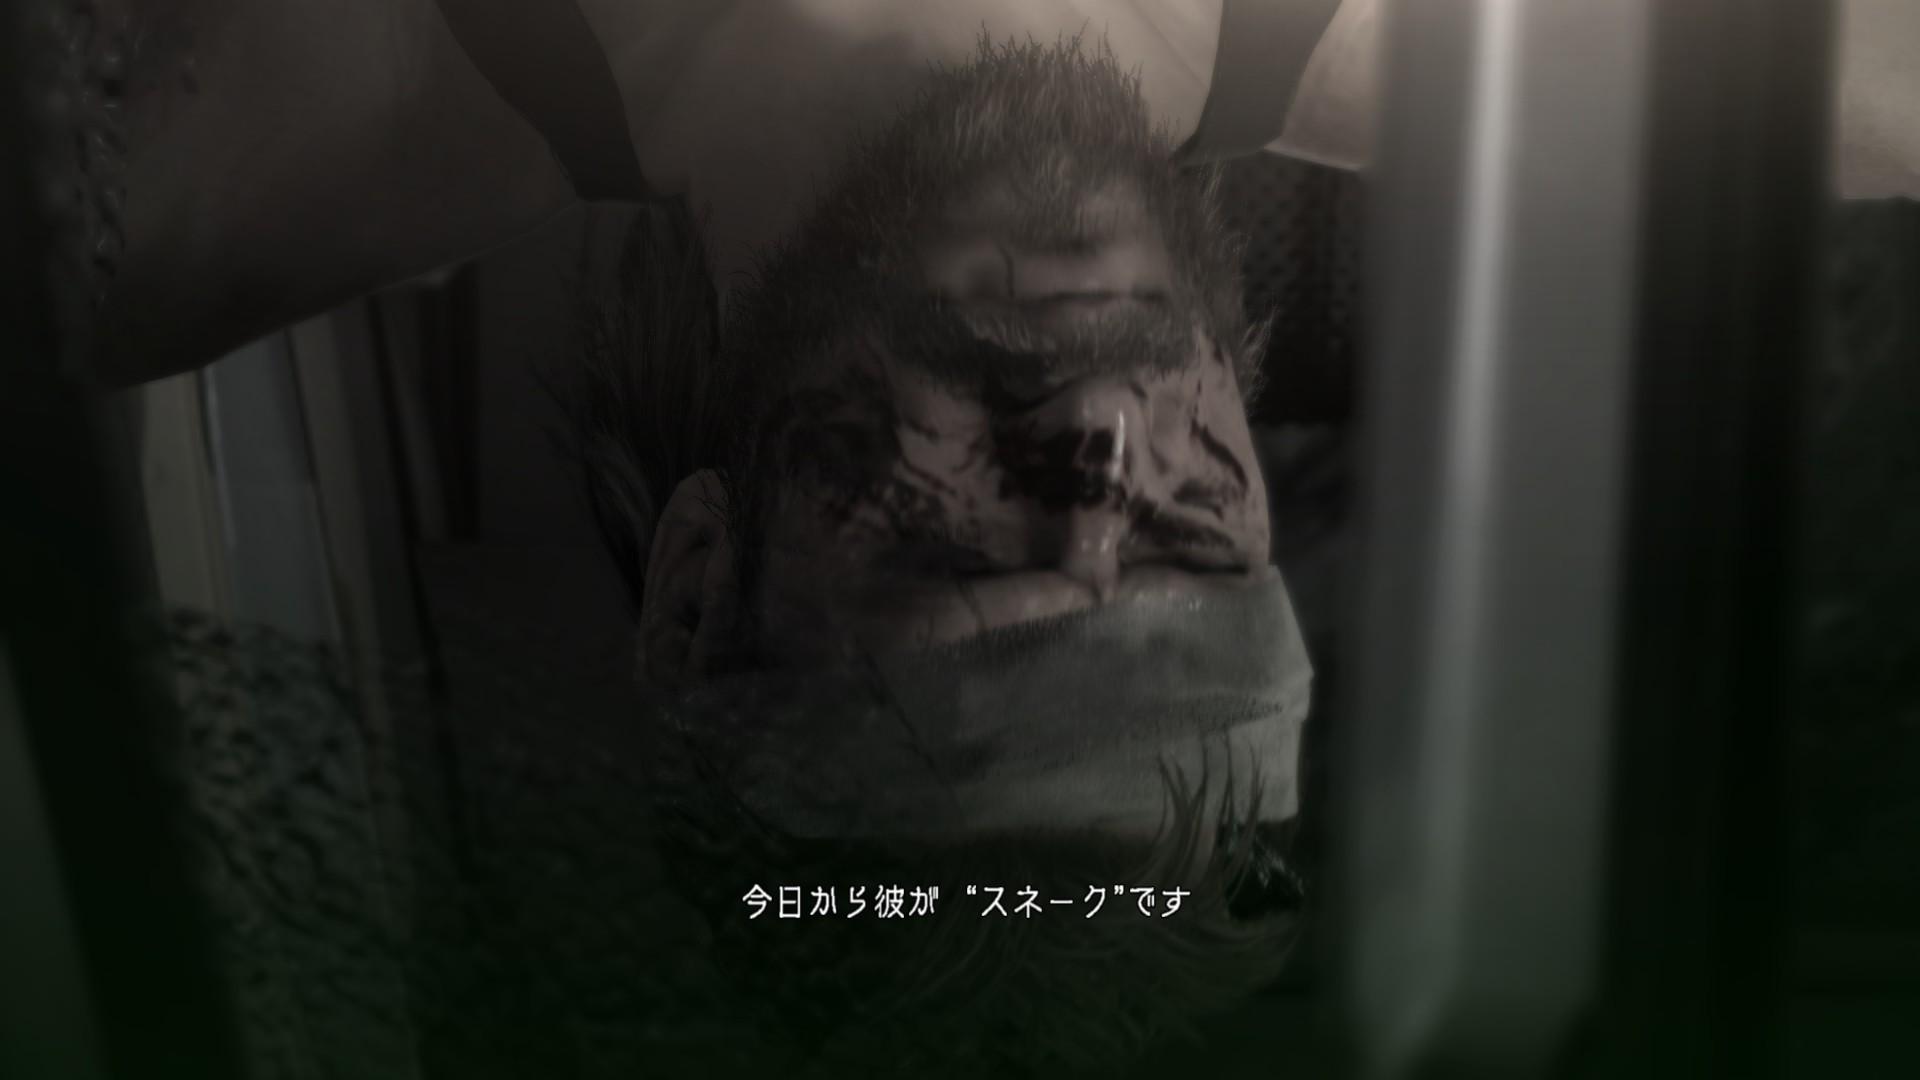 mgs5tpp_048.jpg